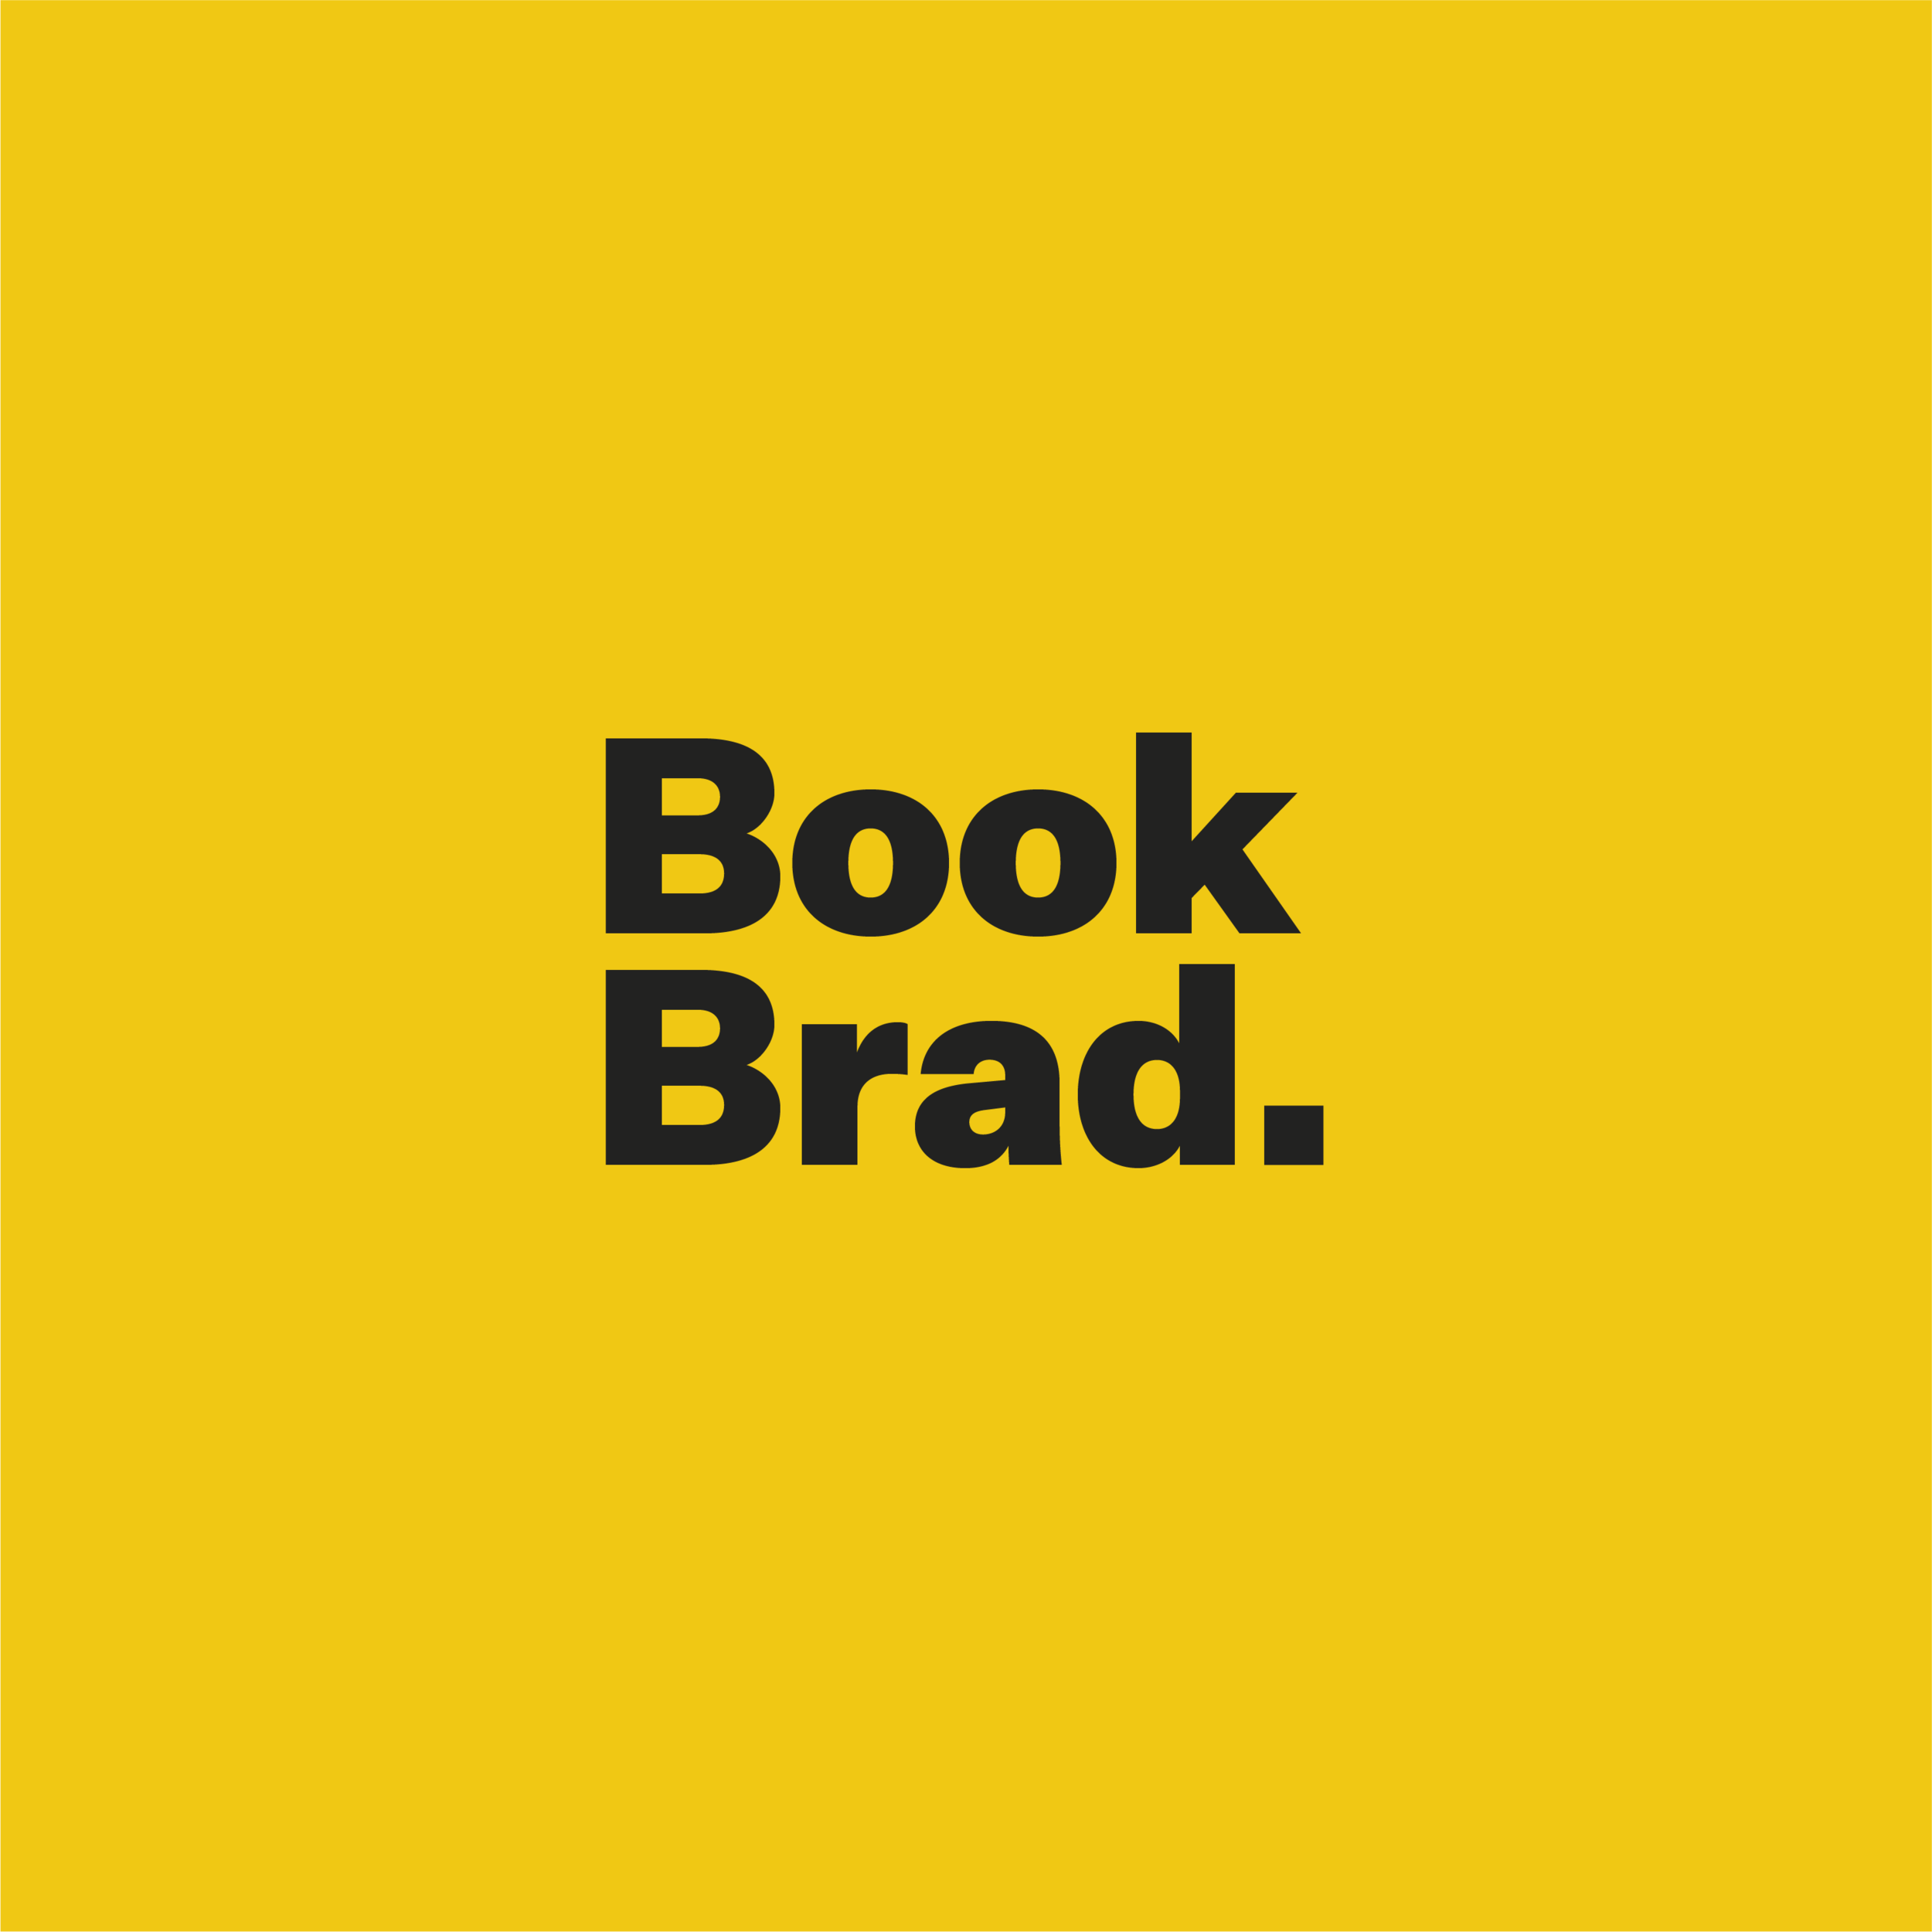 Brad Brosnan - Social Media - Colour_Book Brad.png